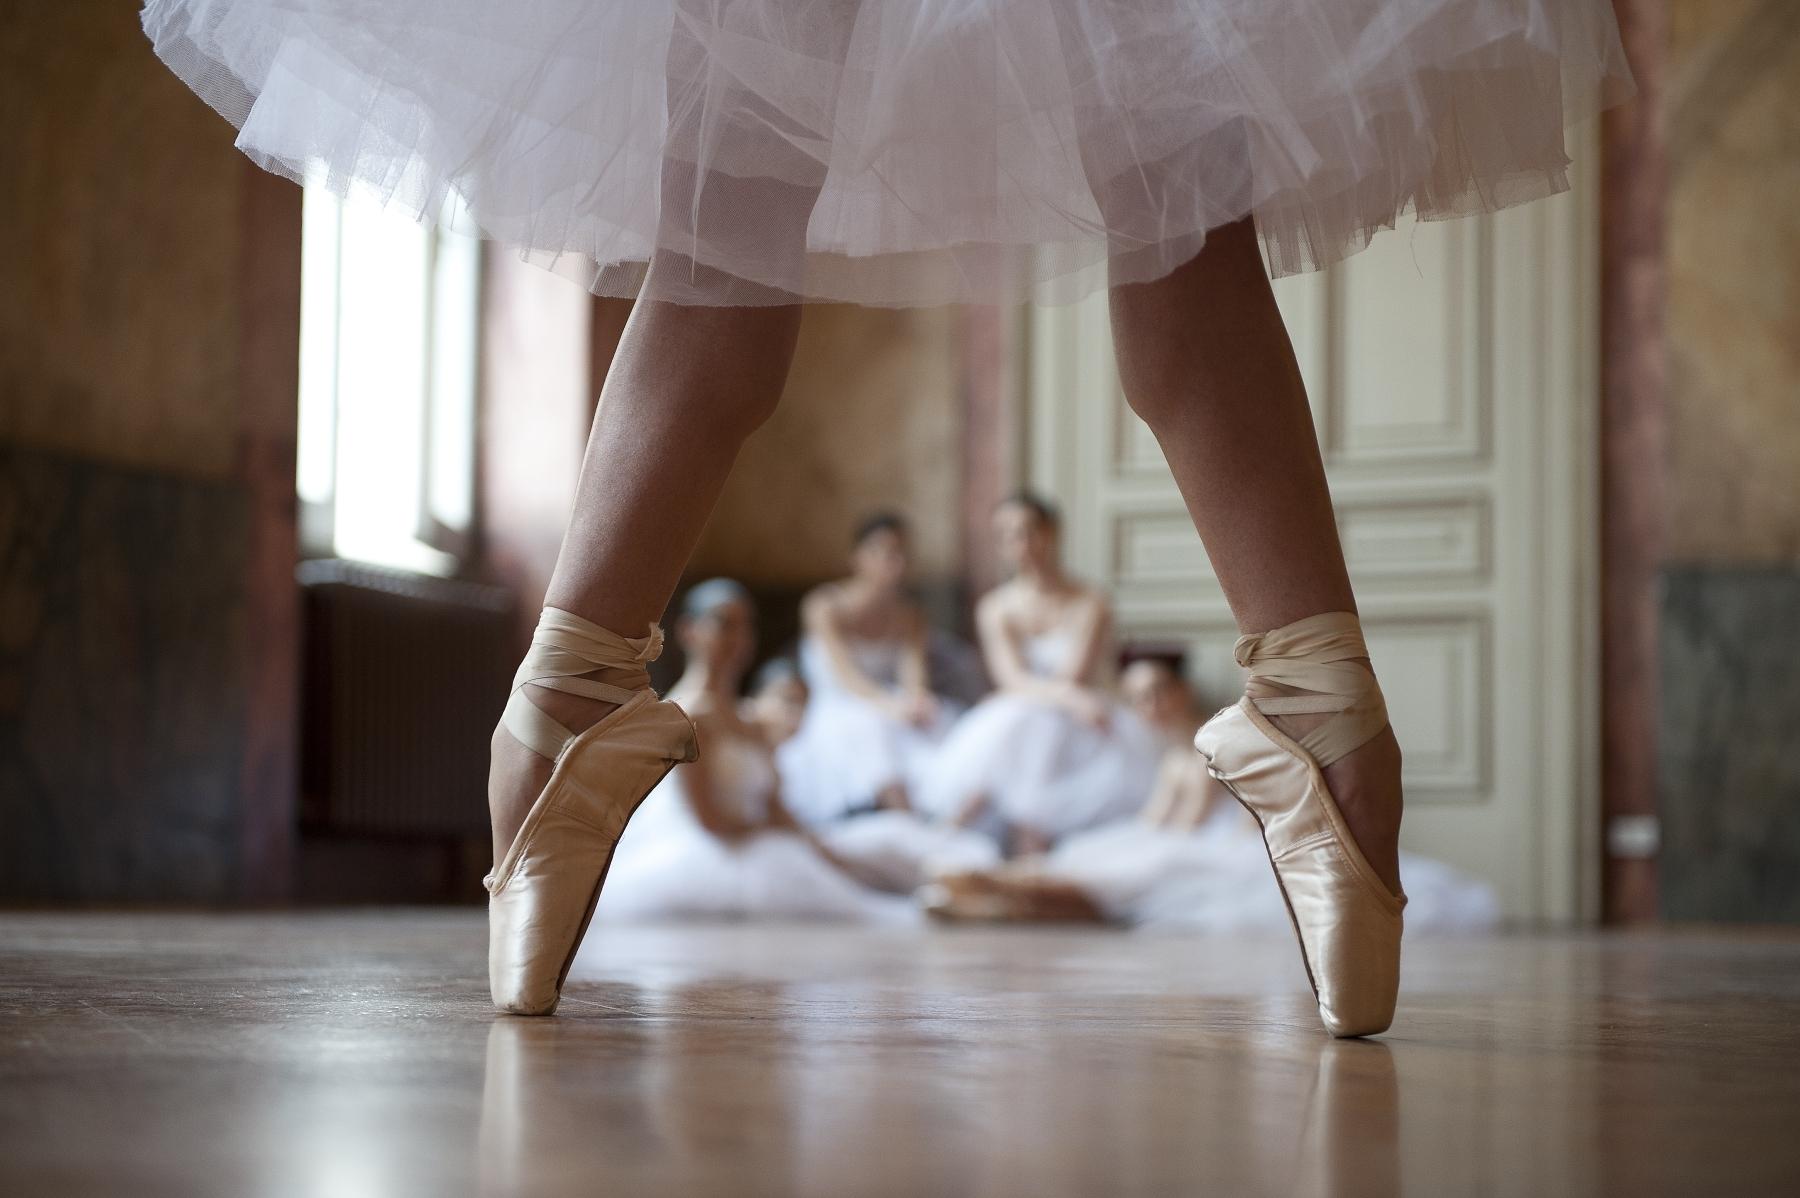 Фото позиций балерин 22 фотография